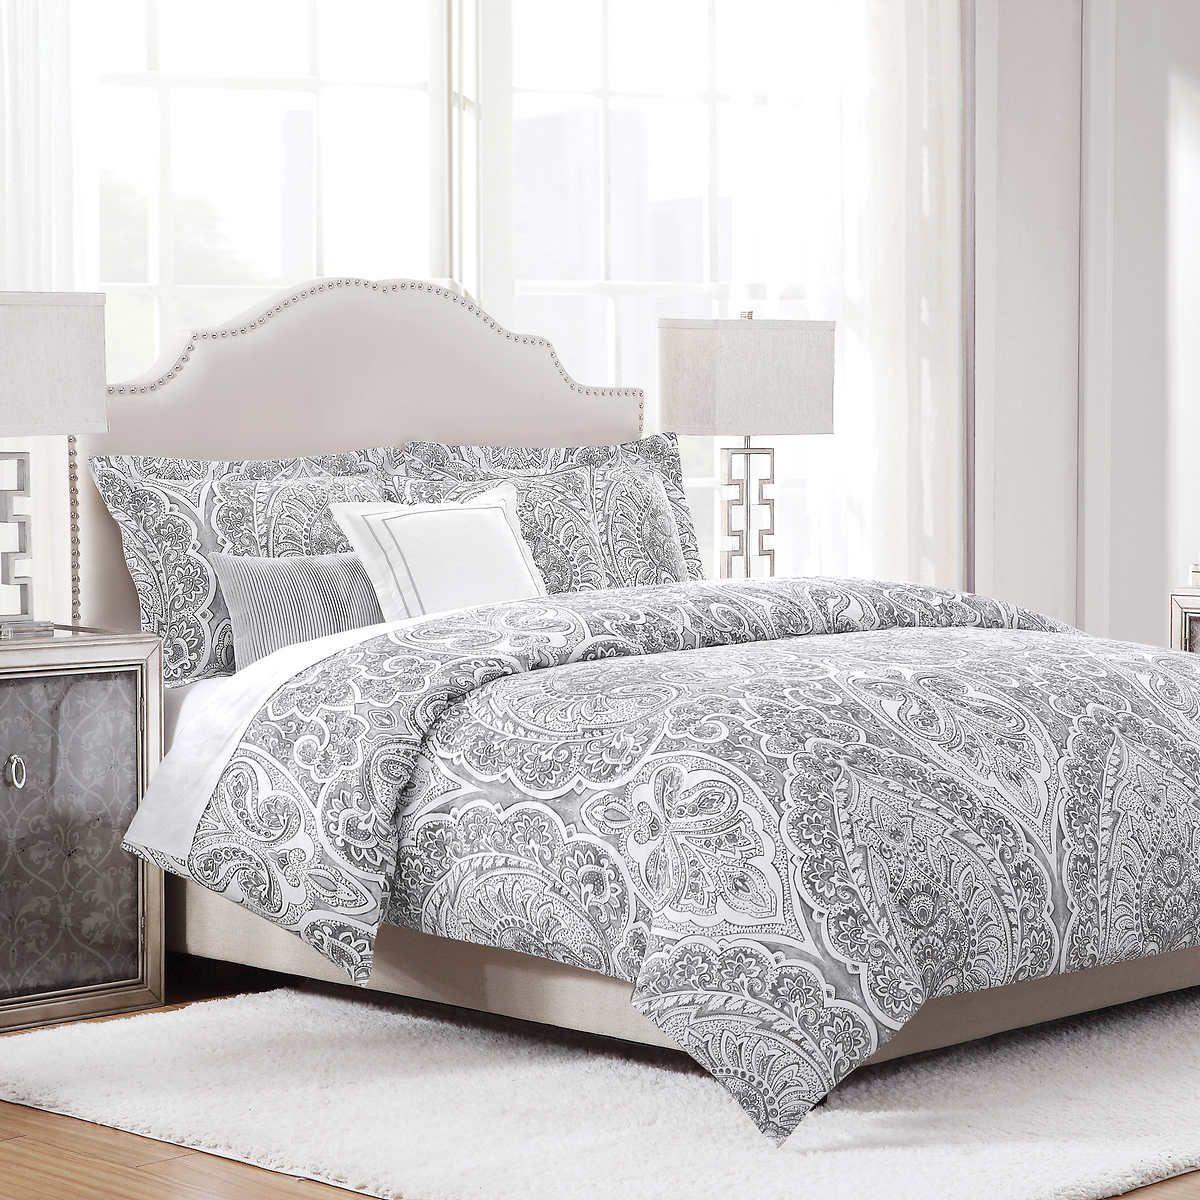 Costco. king sized gray comforter set | Grey comforter, Grey